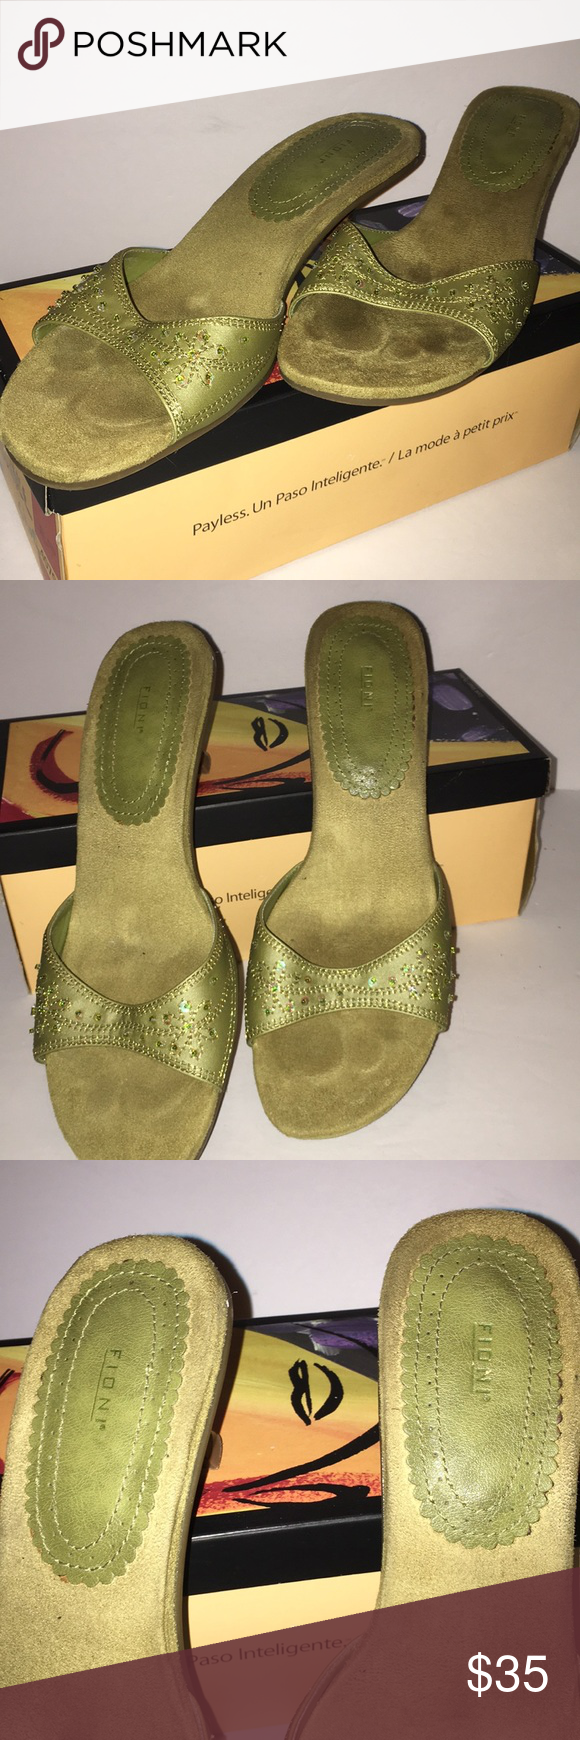 d3da00fd6566 Women s lime green Sandler shoe 1 inch lime green heel Kastle sandal by  Fioni with